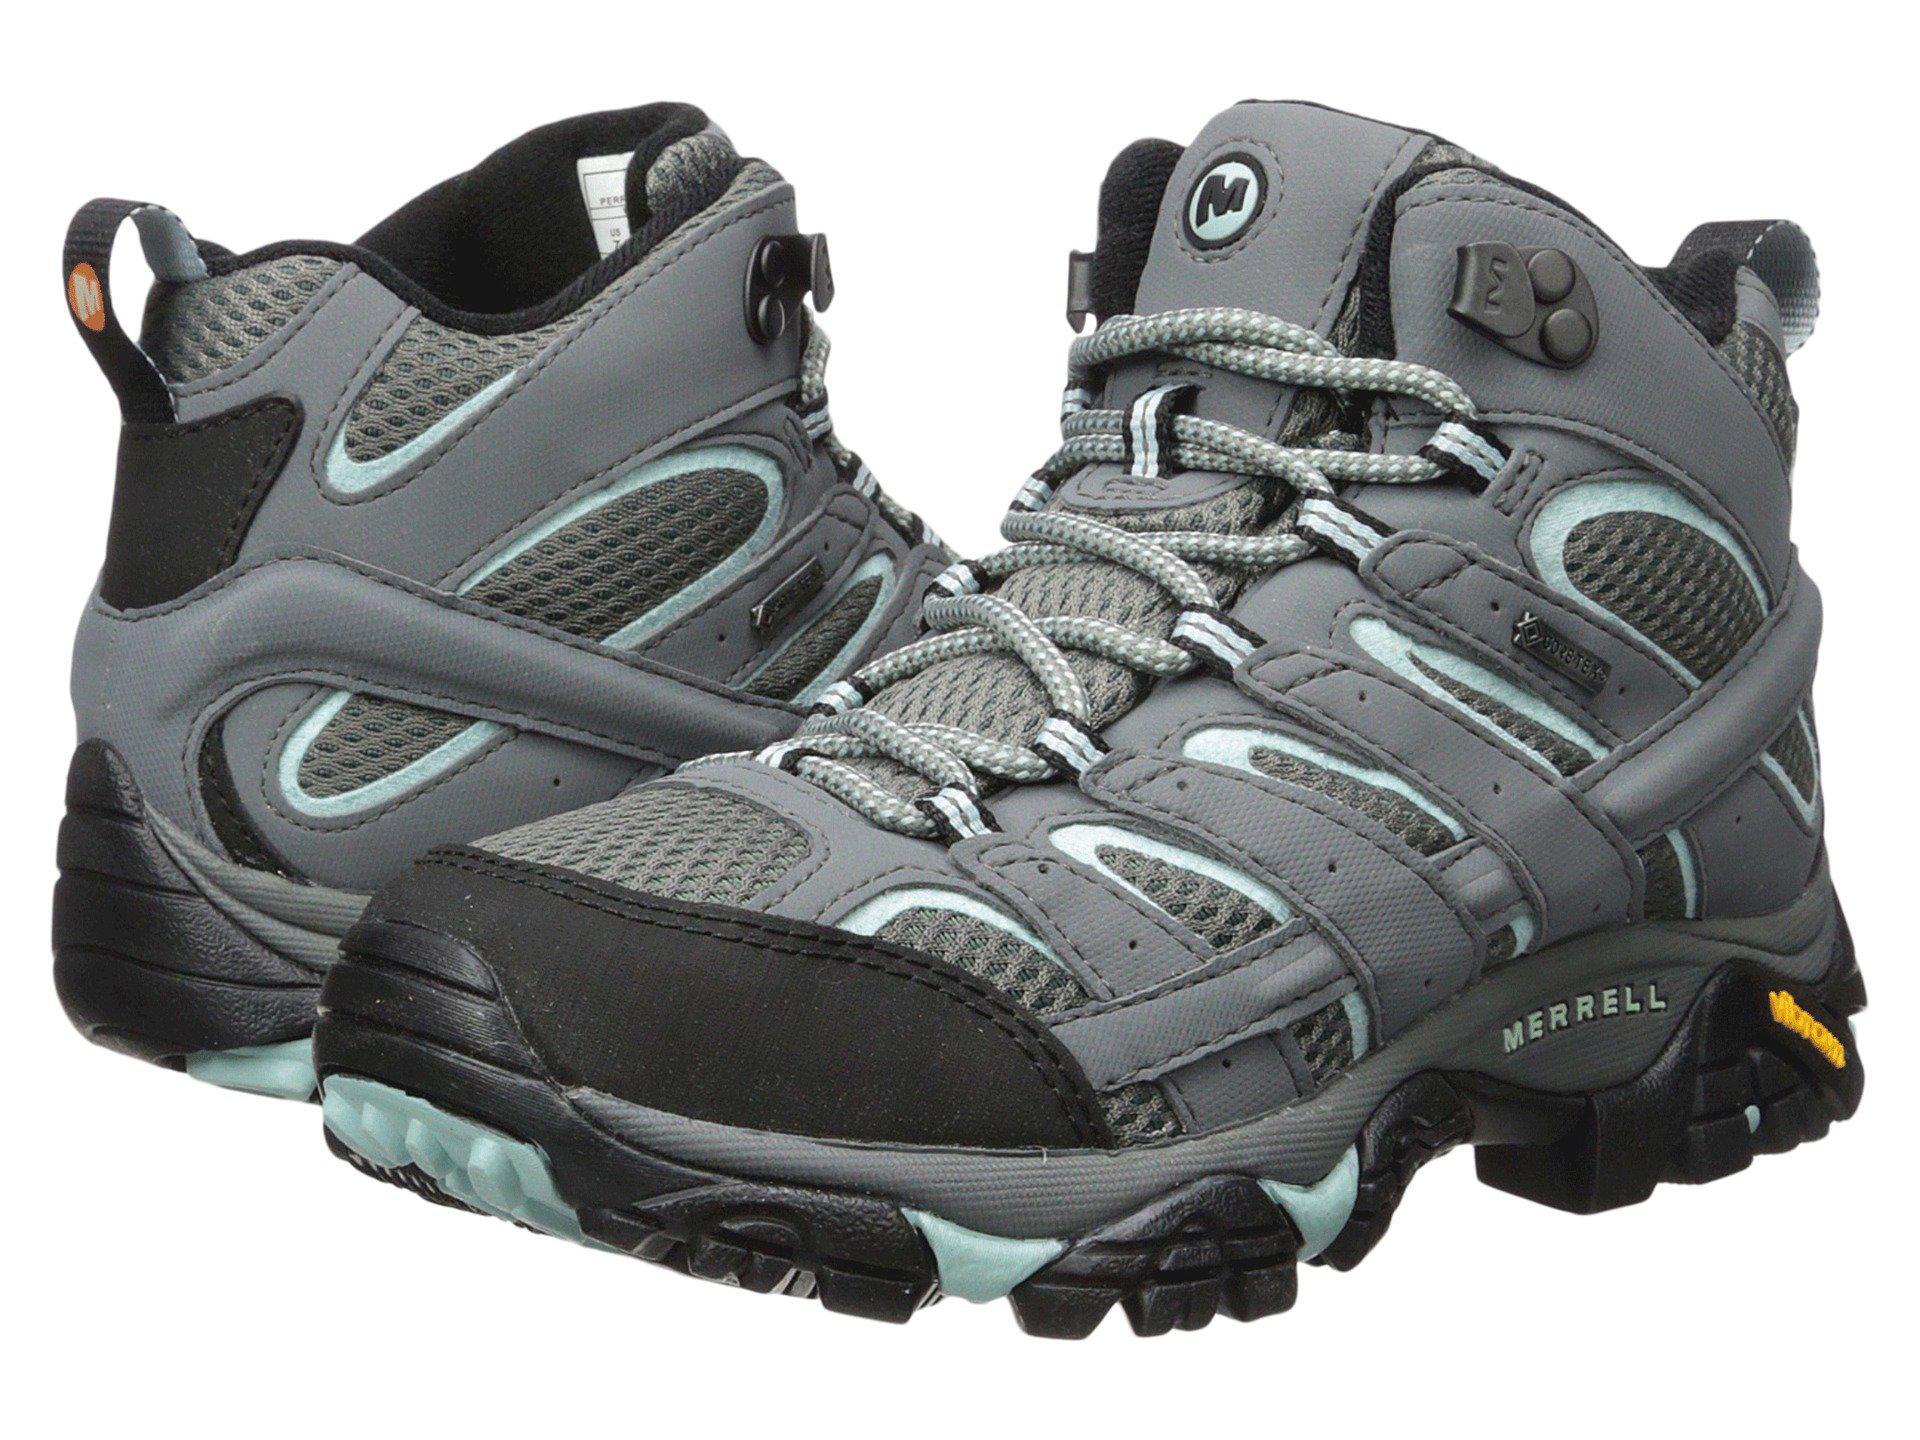 697a2a37bdf Women's Moab 2 Mid Waterproof Hiking Boots